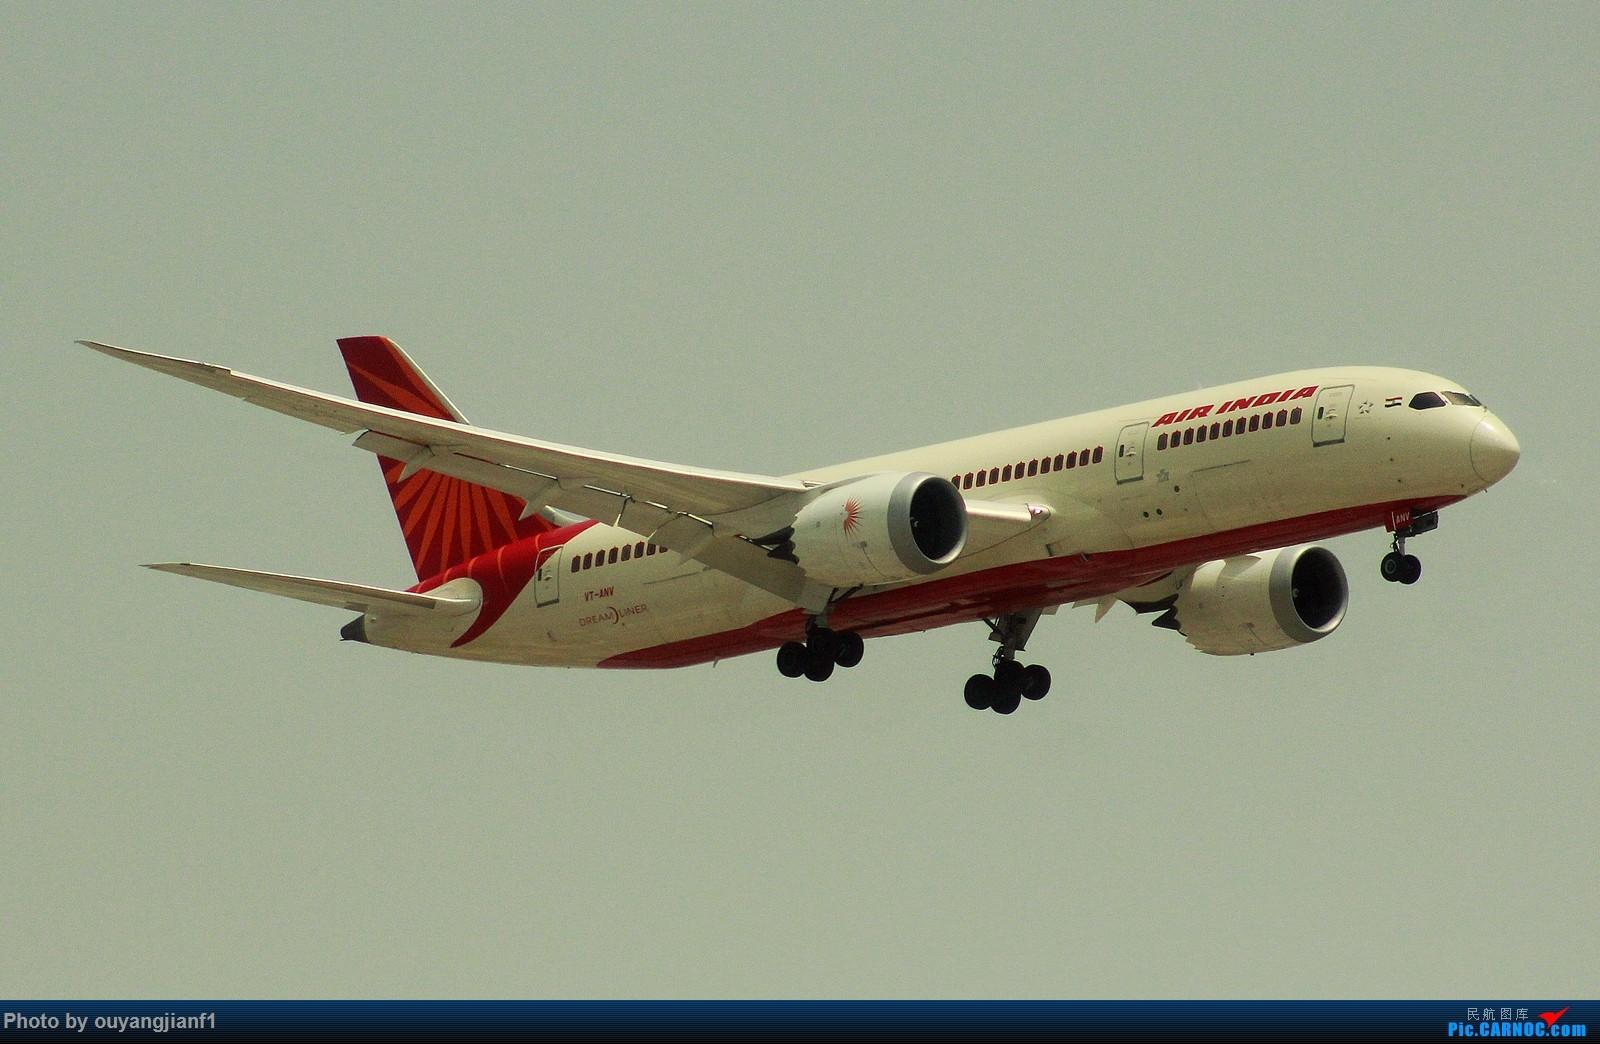 Re:[原创]很多年没有来贴图区了,记一次本不在计划中的迪拜拍机之行,在漫天黄沙中EK的380和777真的看到吐血.... BOEING 787-8 VT-ANV 阿拉伯联合酋长国迪拜国际机场